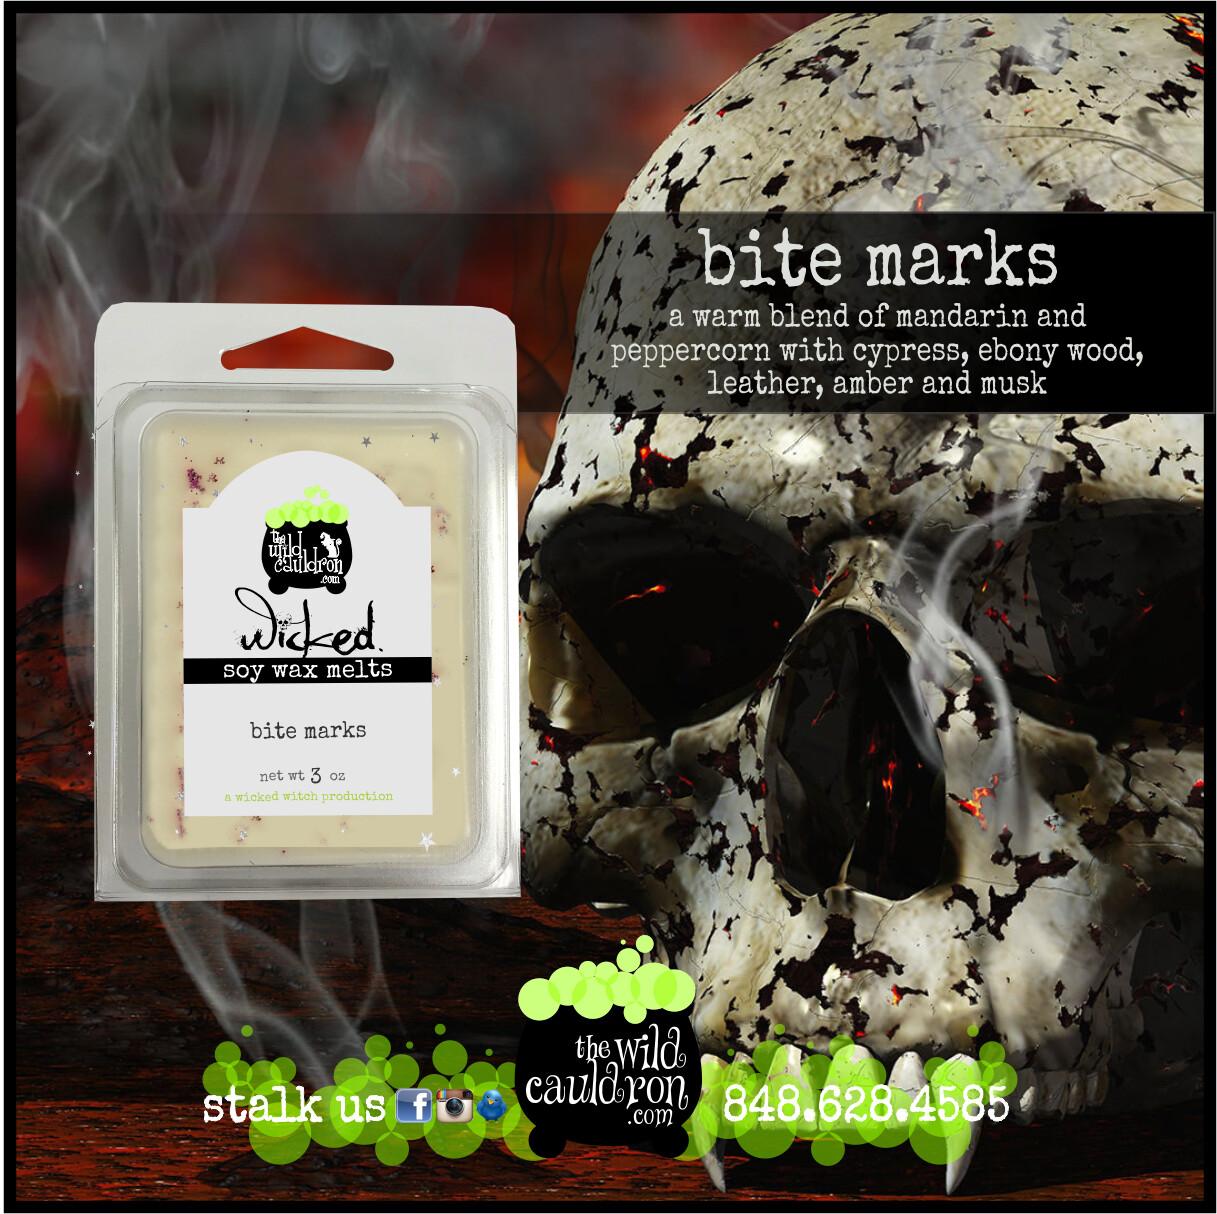 Bite Marks Wicked Wax Melts